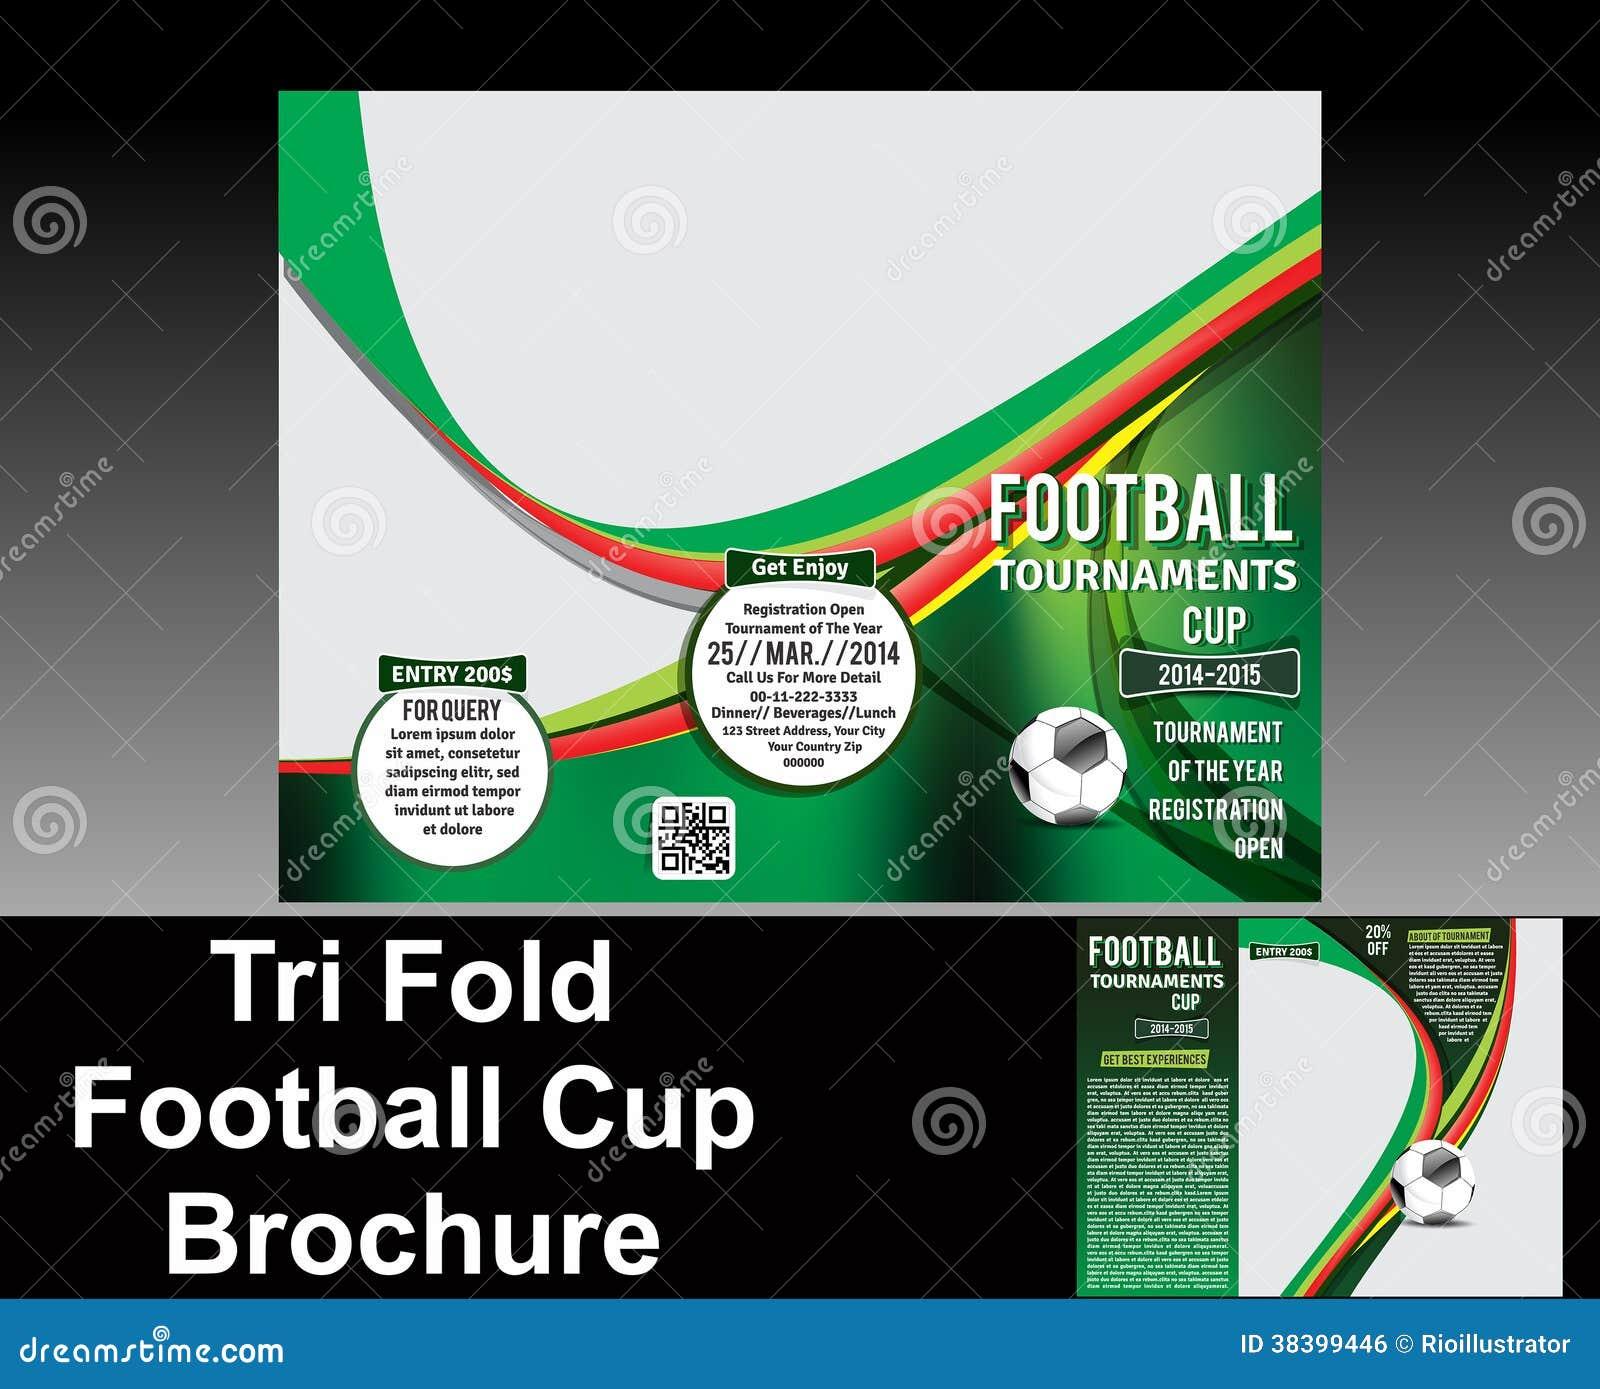 tri fold football brochure design royalty free stock image